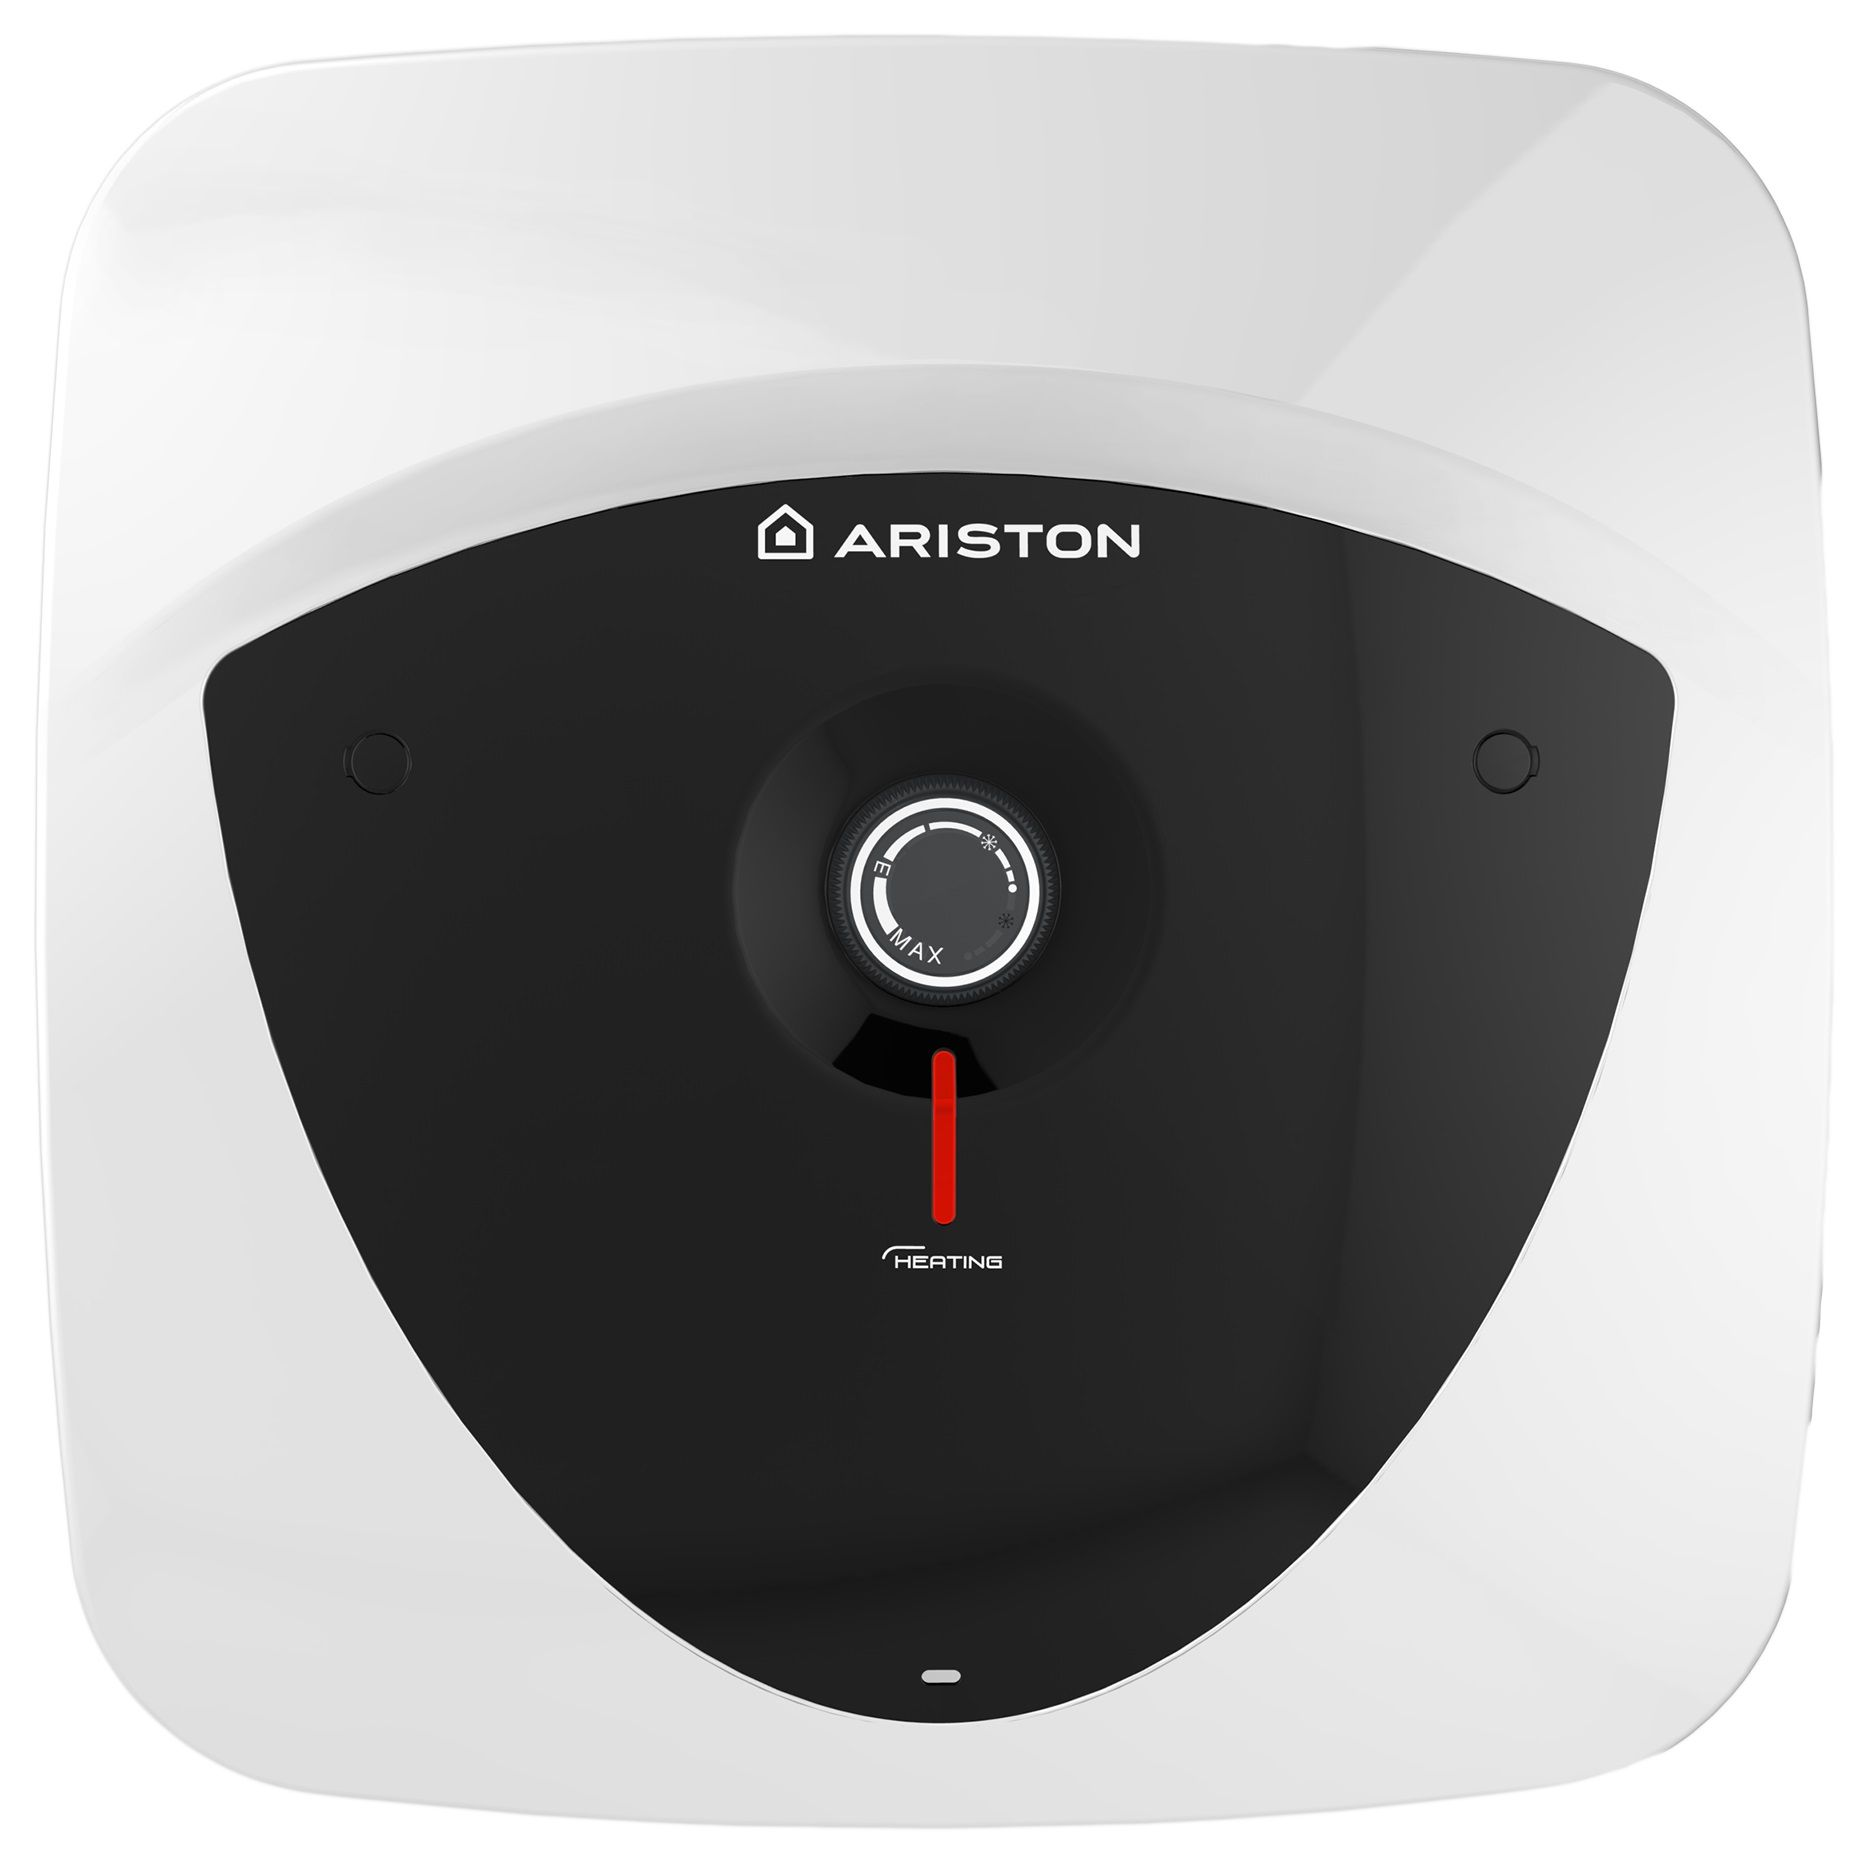 Boiler electric Ariston Andris LUX 10 EU, 10 l, 1200 W, Led iluminat, Protectie electrica IPX5, Montare deasupra chiuvetei, Reglaj extern de temperatura imagine fornello.ro